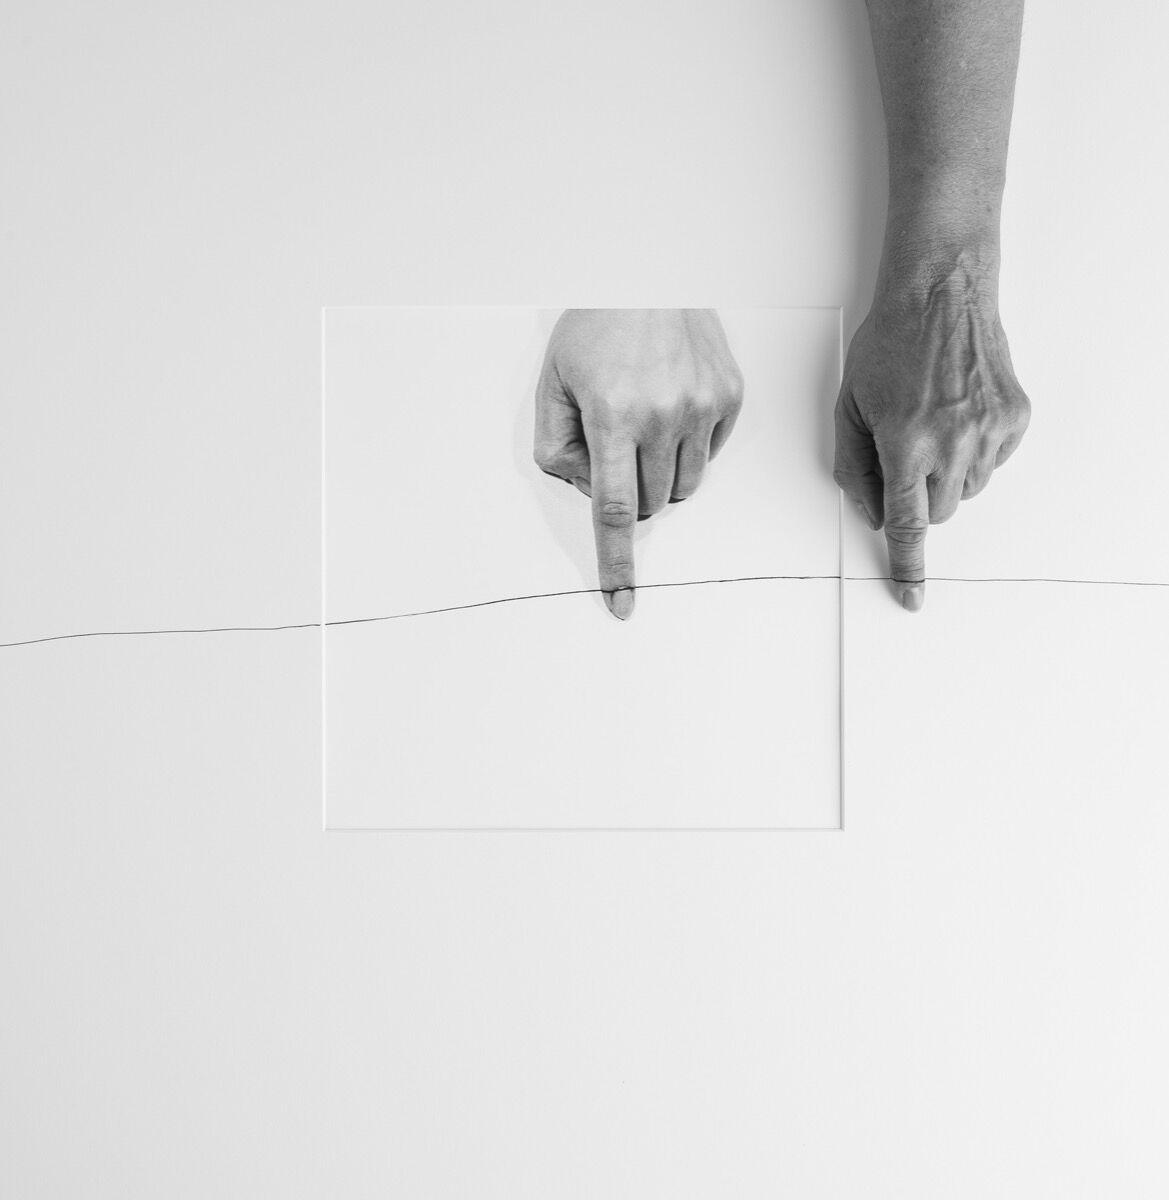 Liliana Porter,Forty Years IIIB (hand over horizontal line 1973), 2013. Courtesy of Hosfelt Gallery.